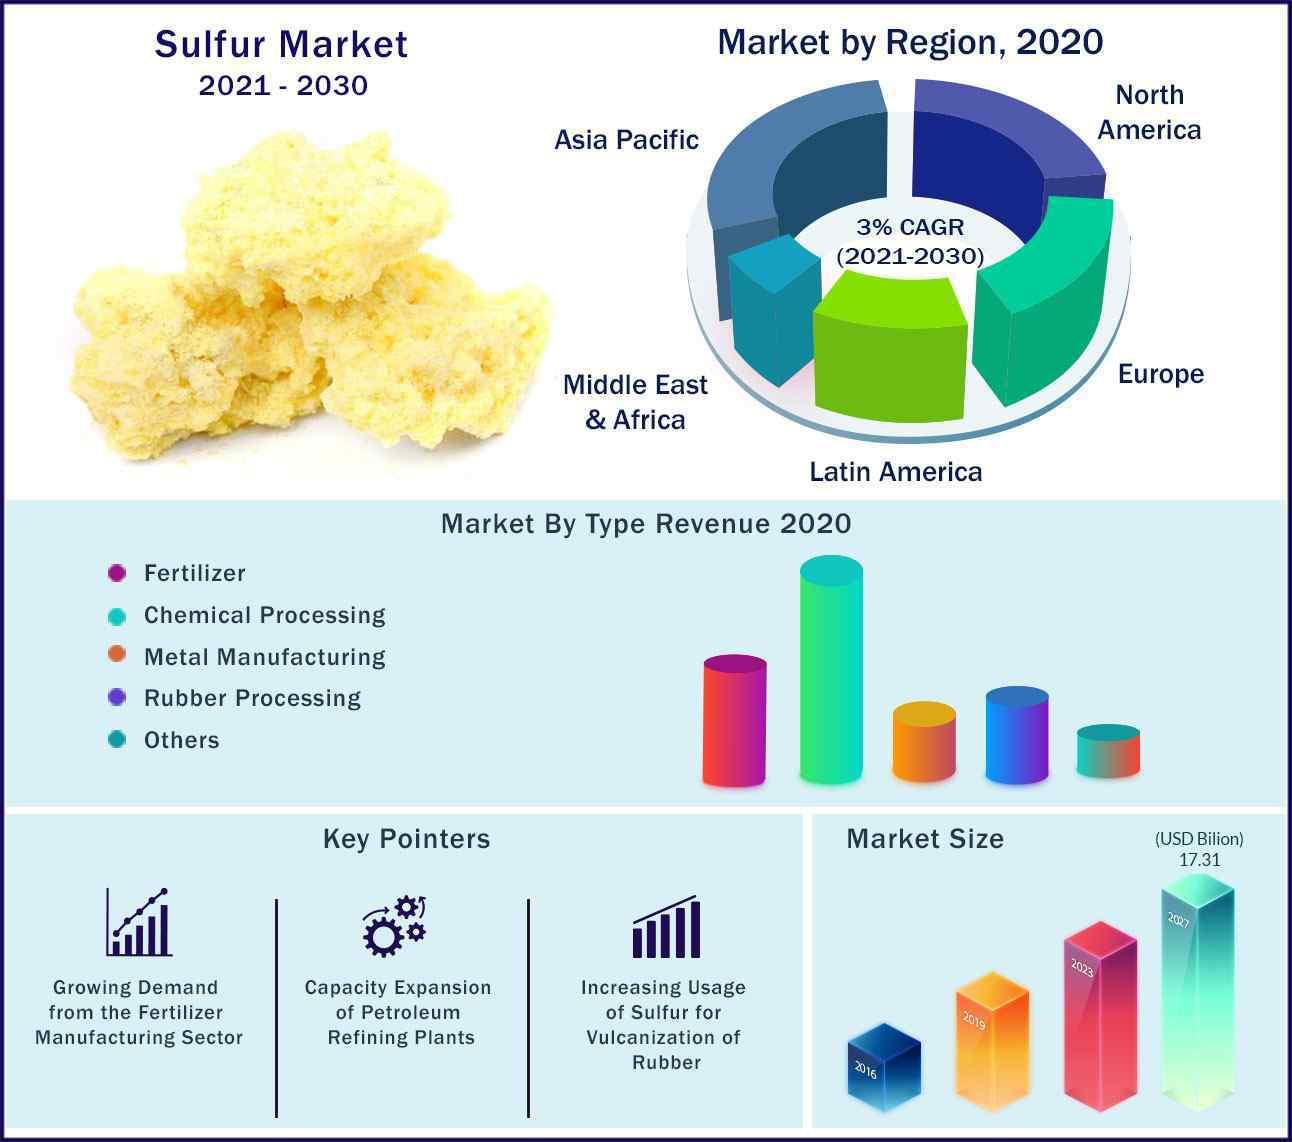 Global Sulfur Market 2021 to 2030